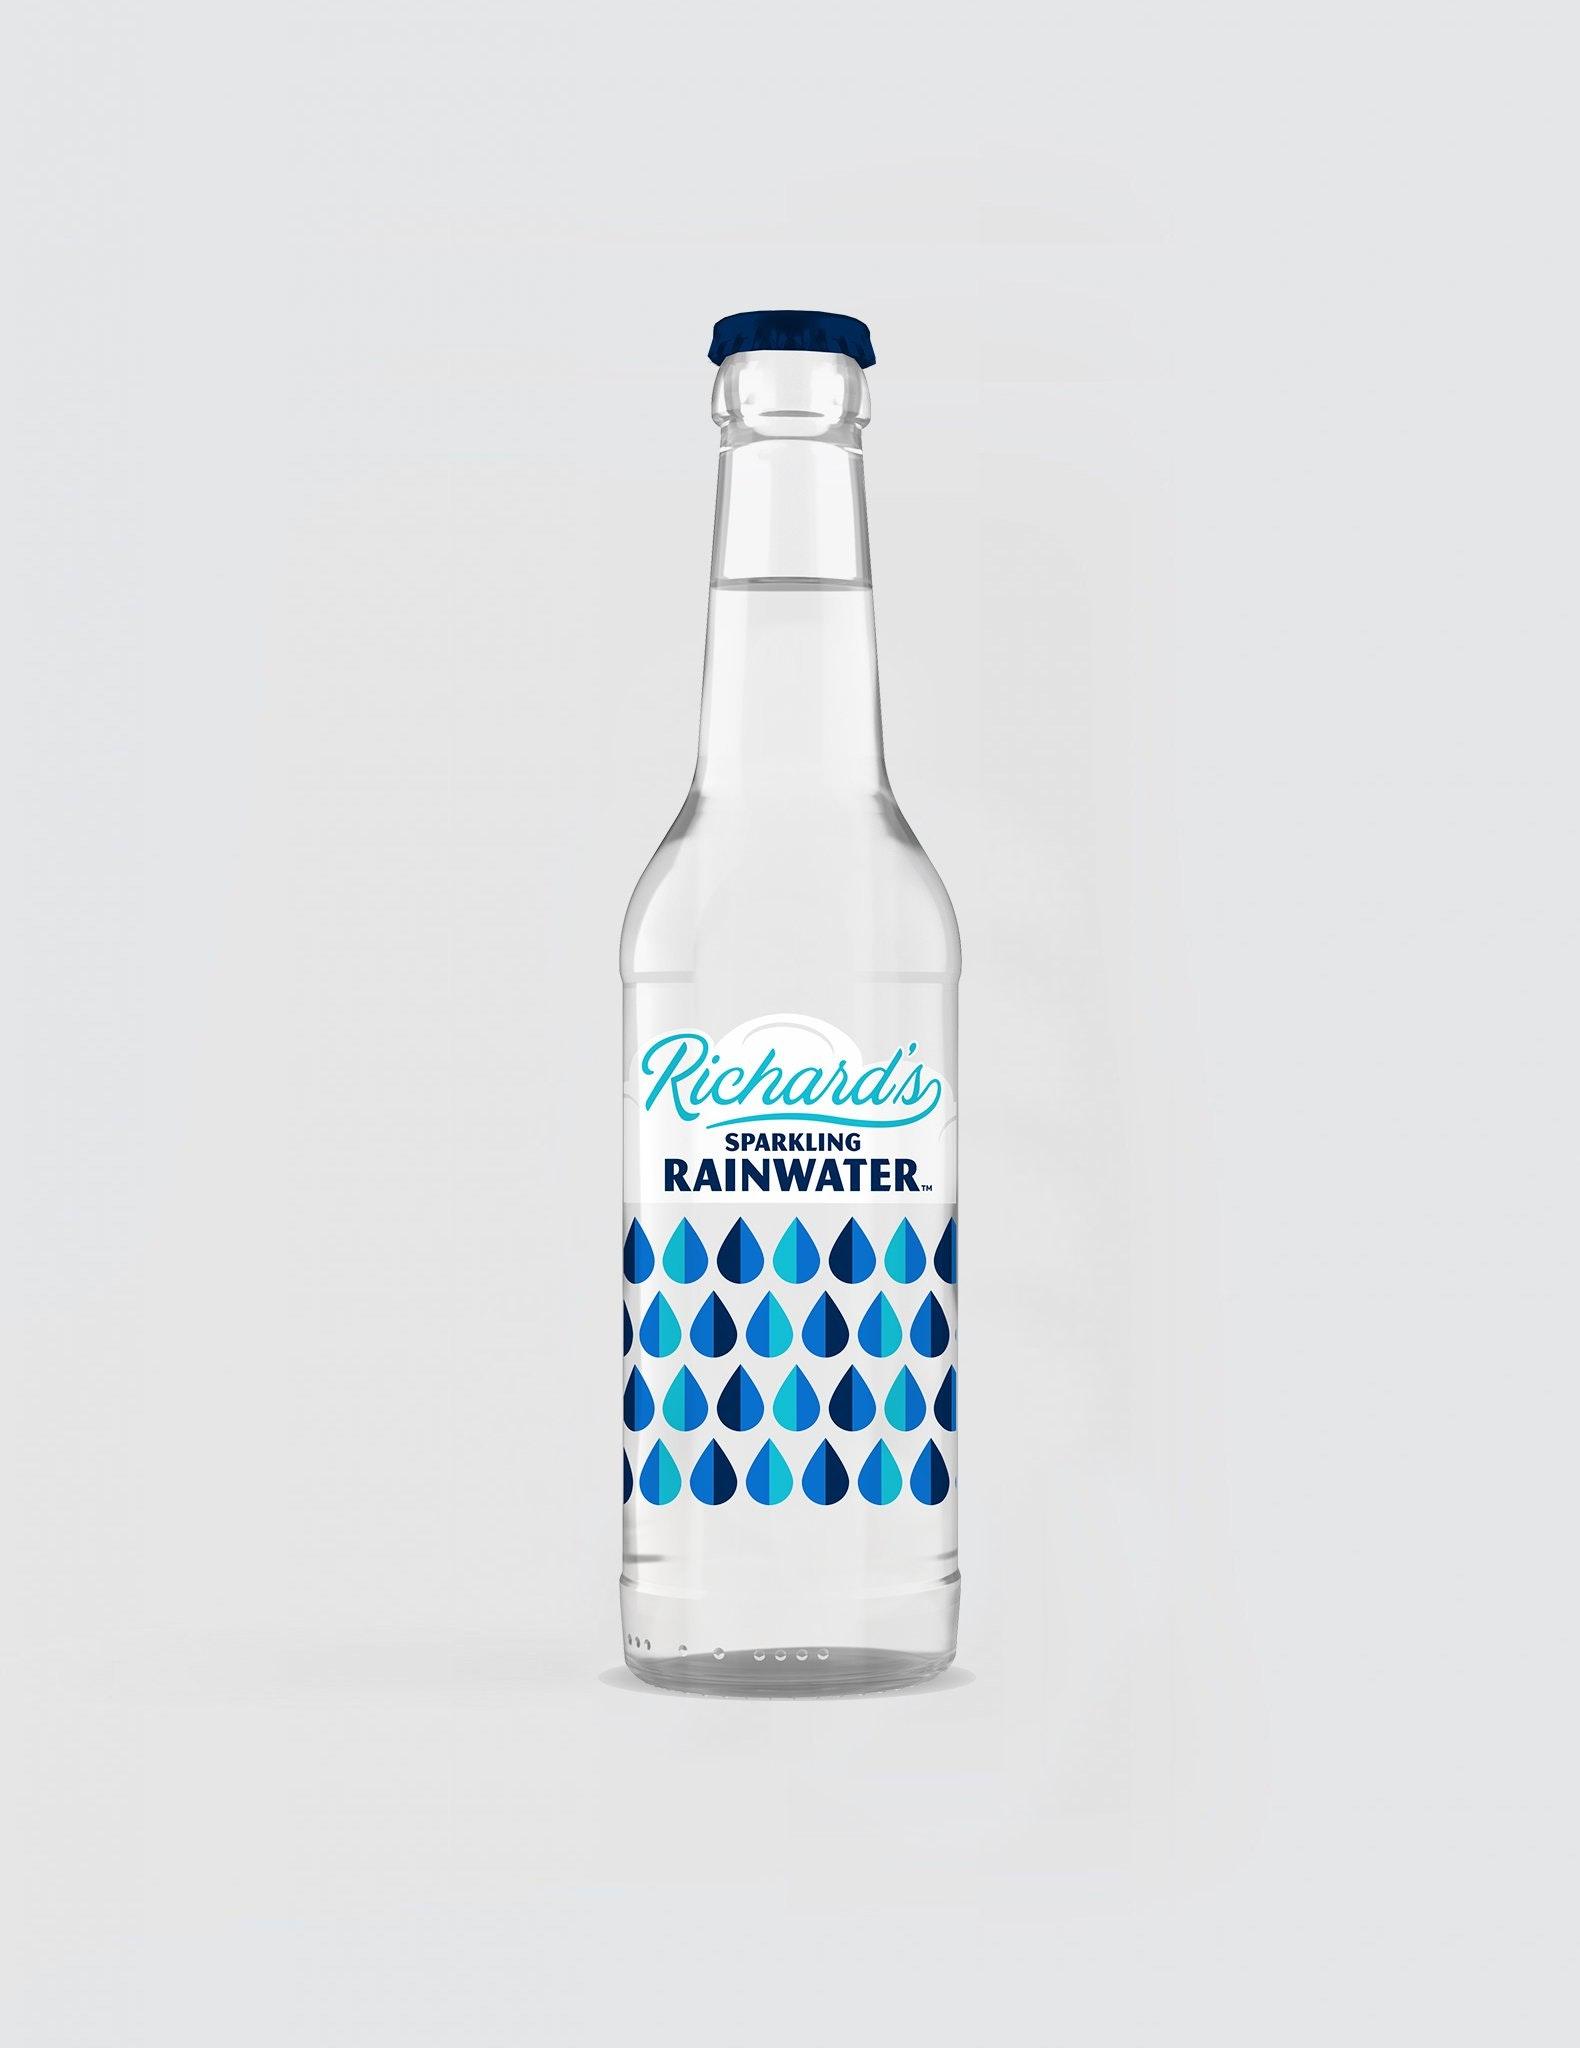 Richard's Rain Water